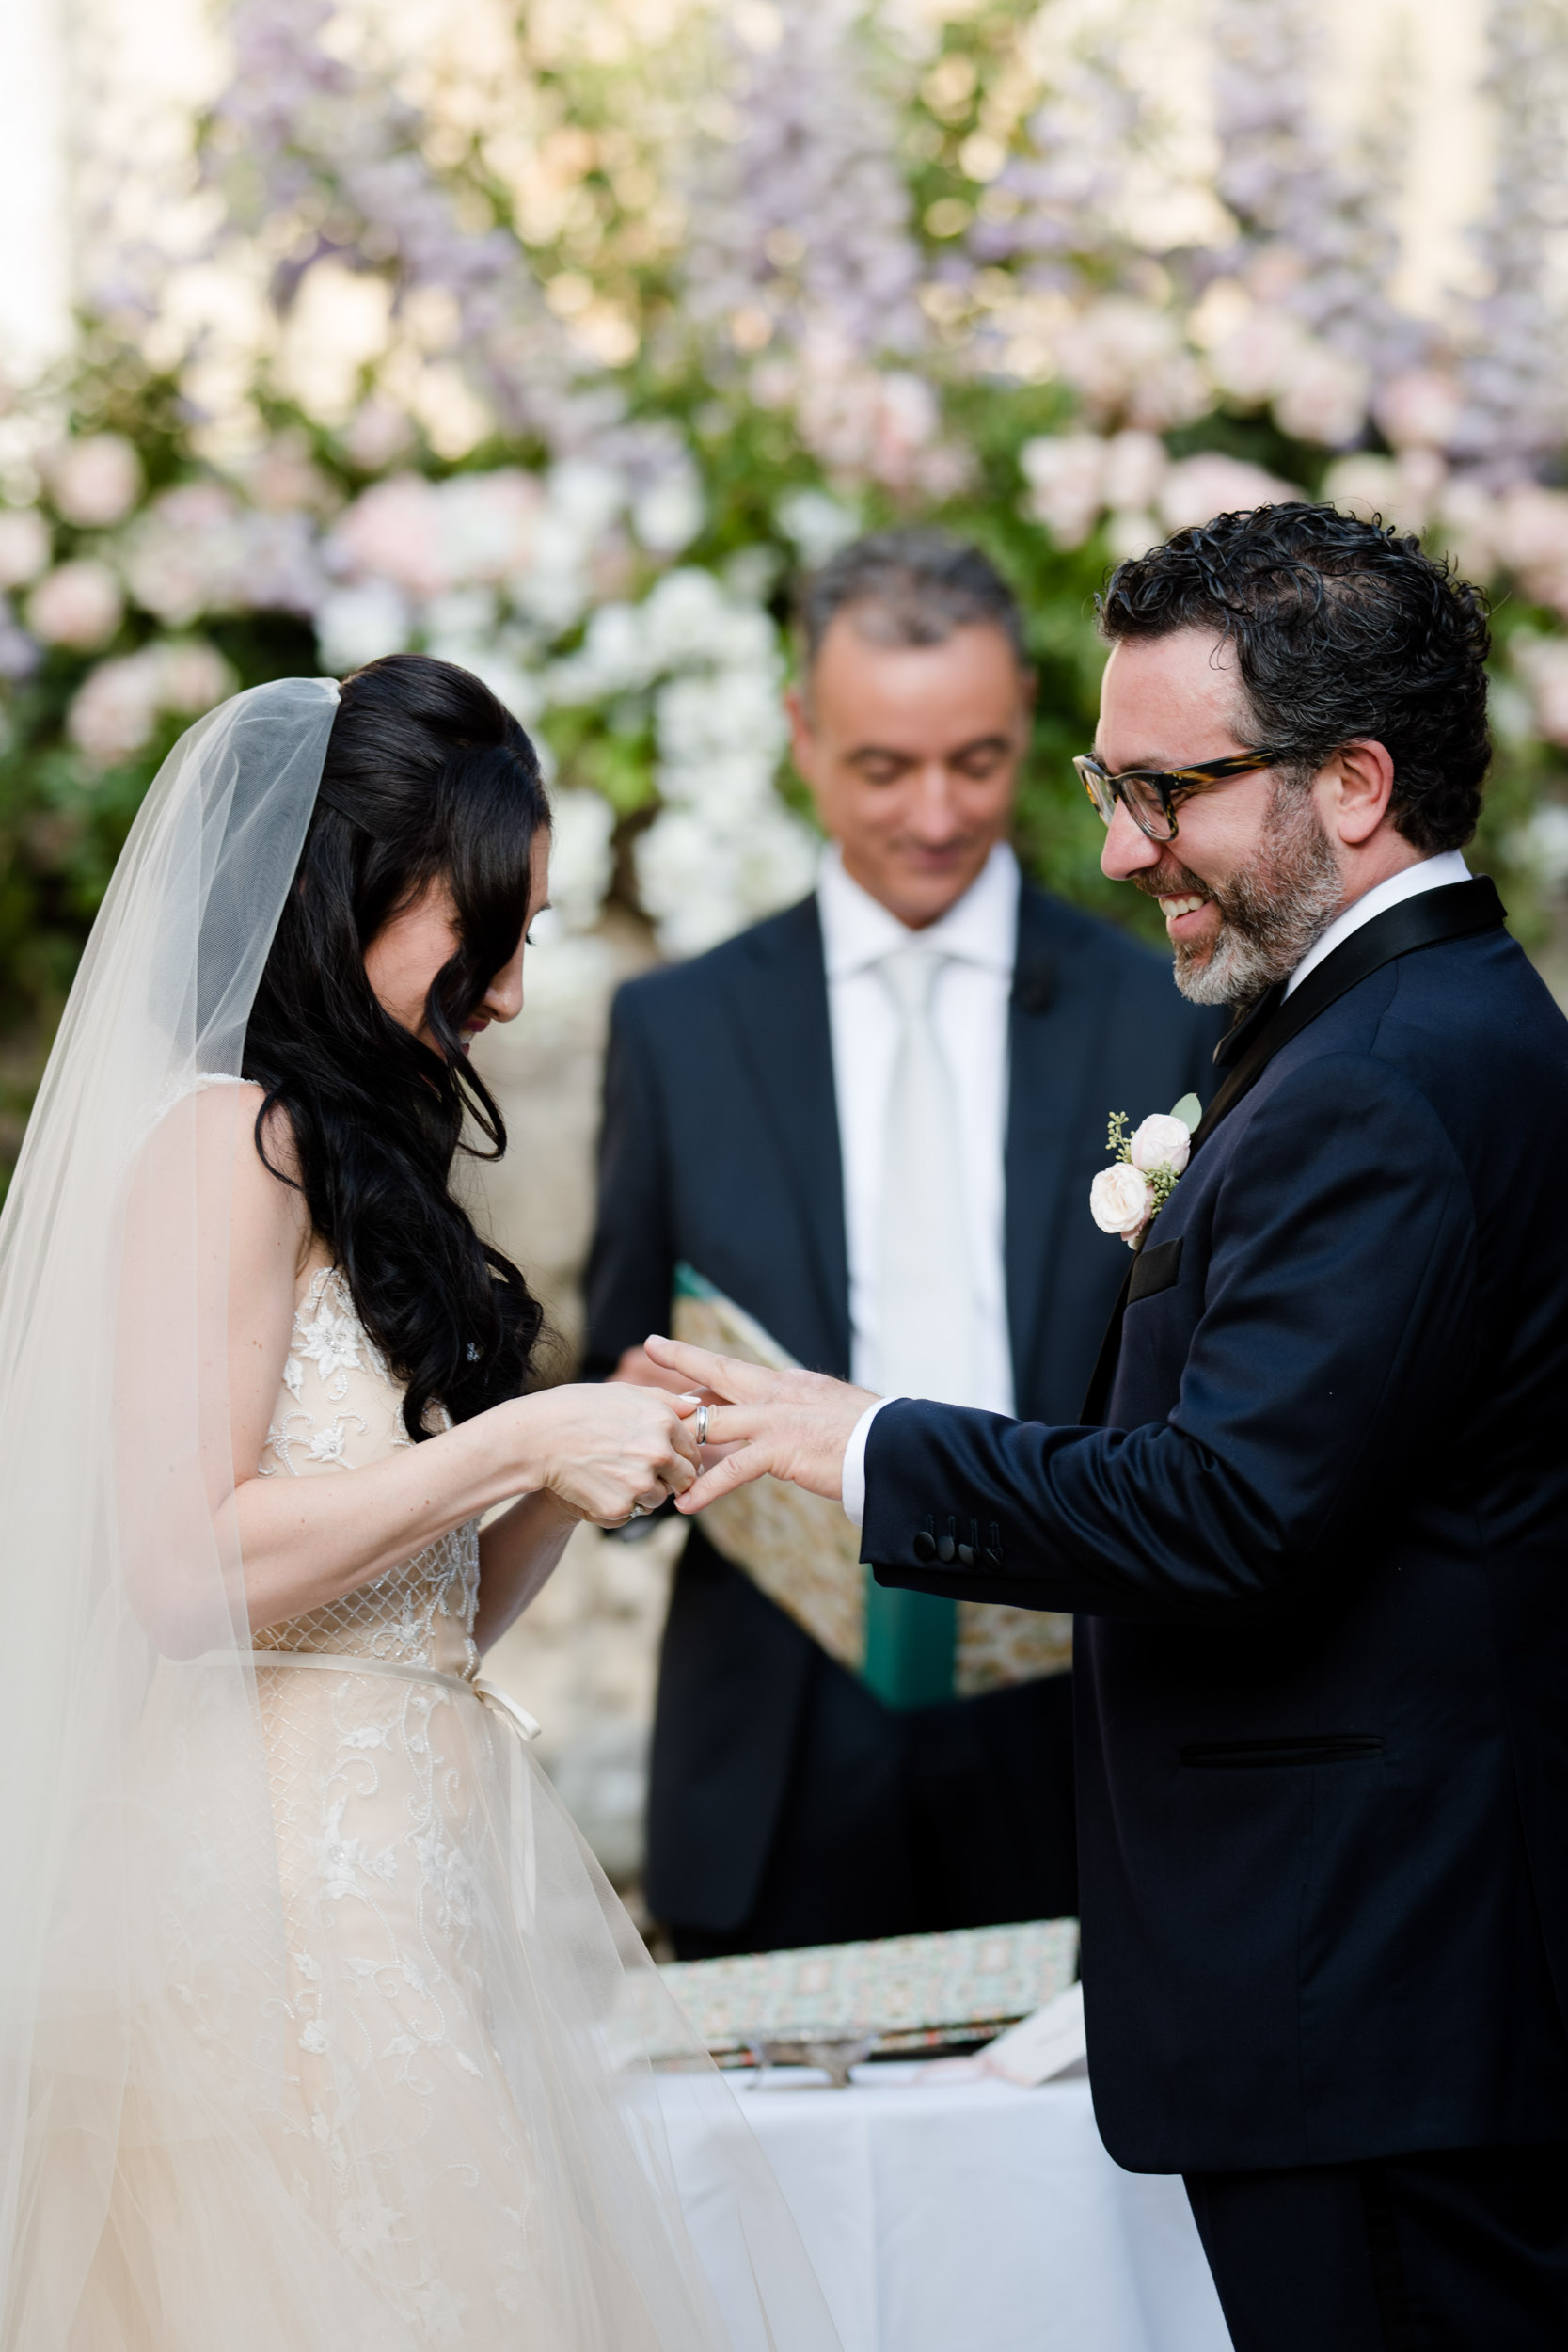 villa-gamberaia-florence-italy-destination-wedding-48.jpg